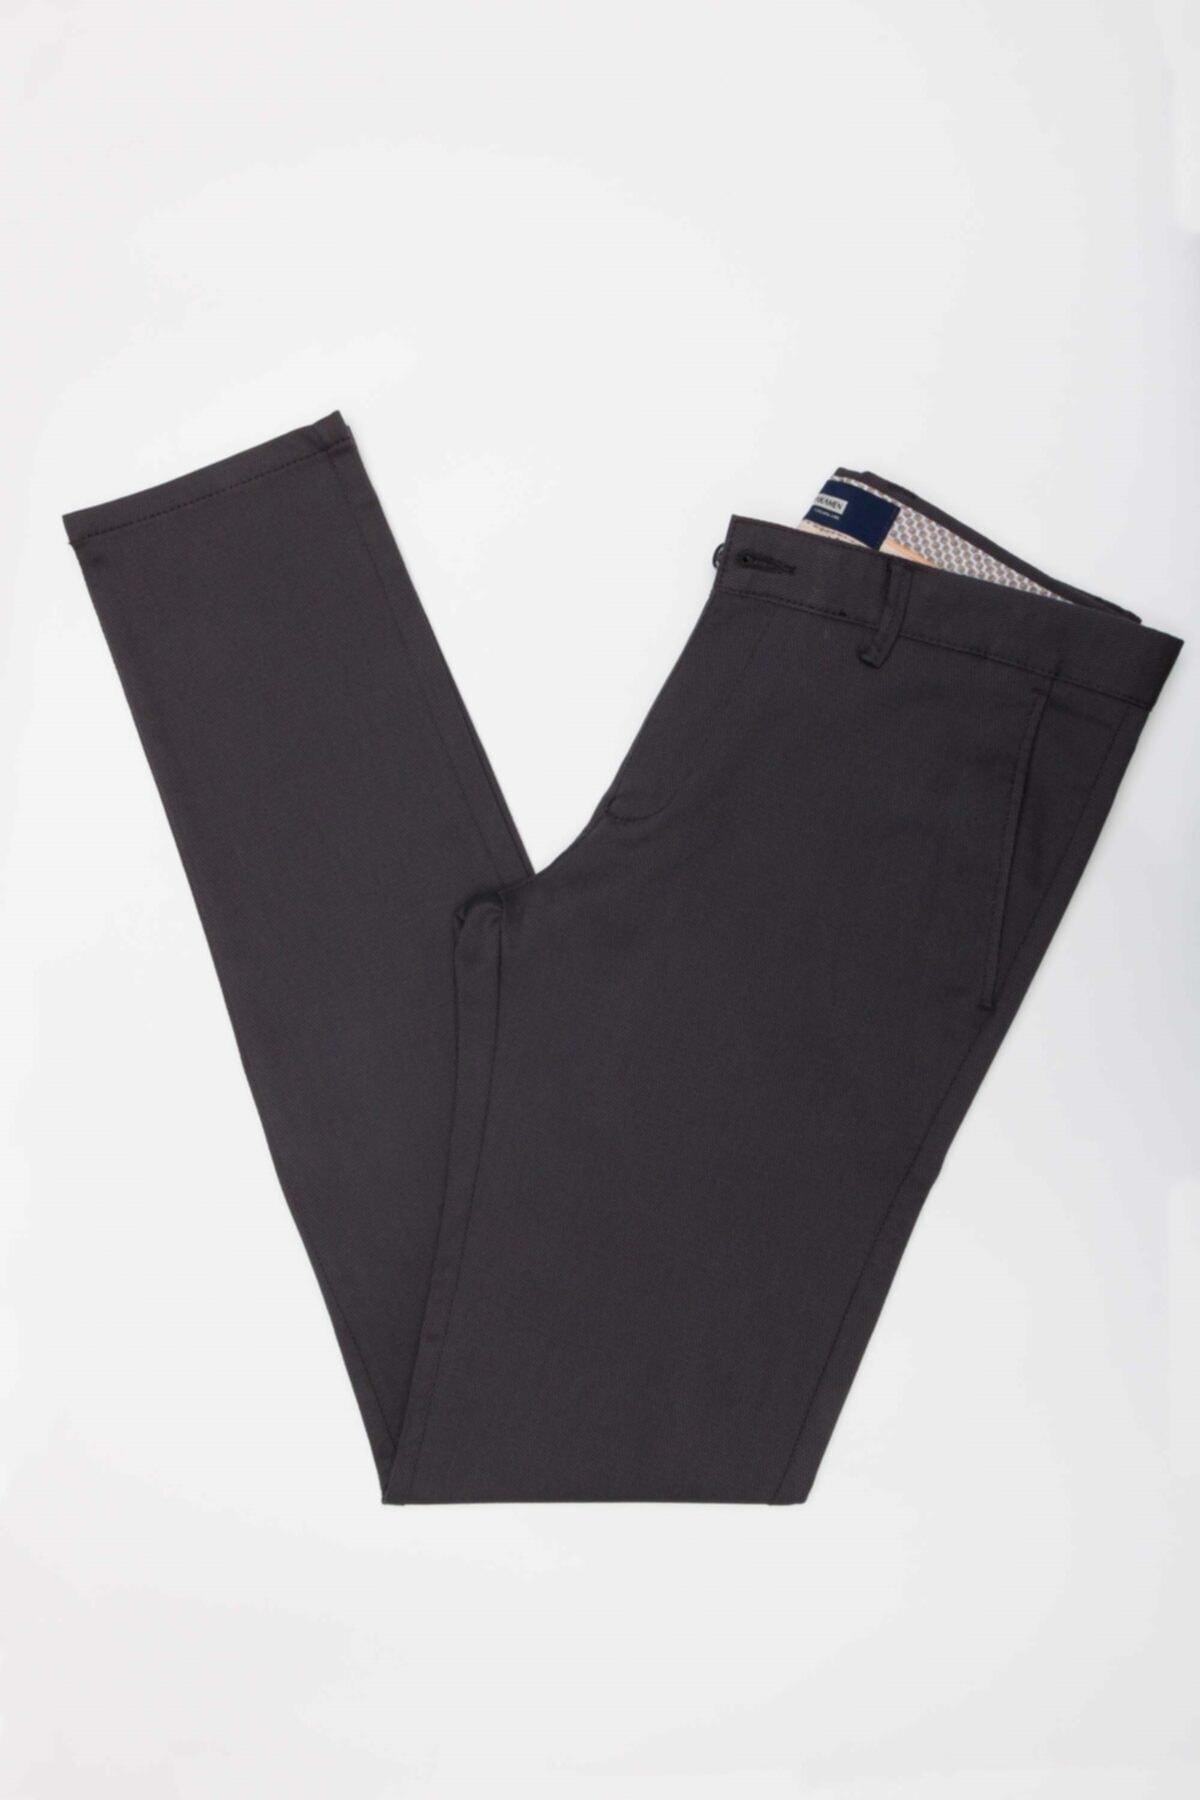 Jakamen Jk31es12m002 Ekstra Slim Erkek Pantolon-19 1